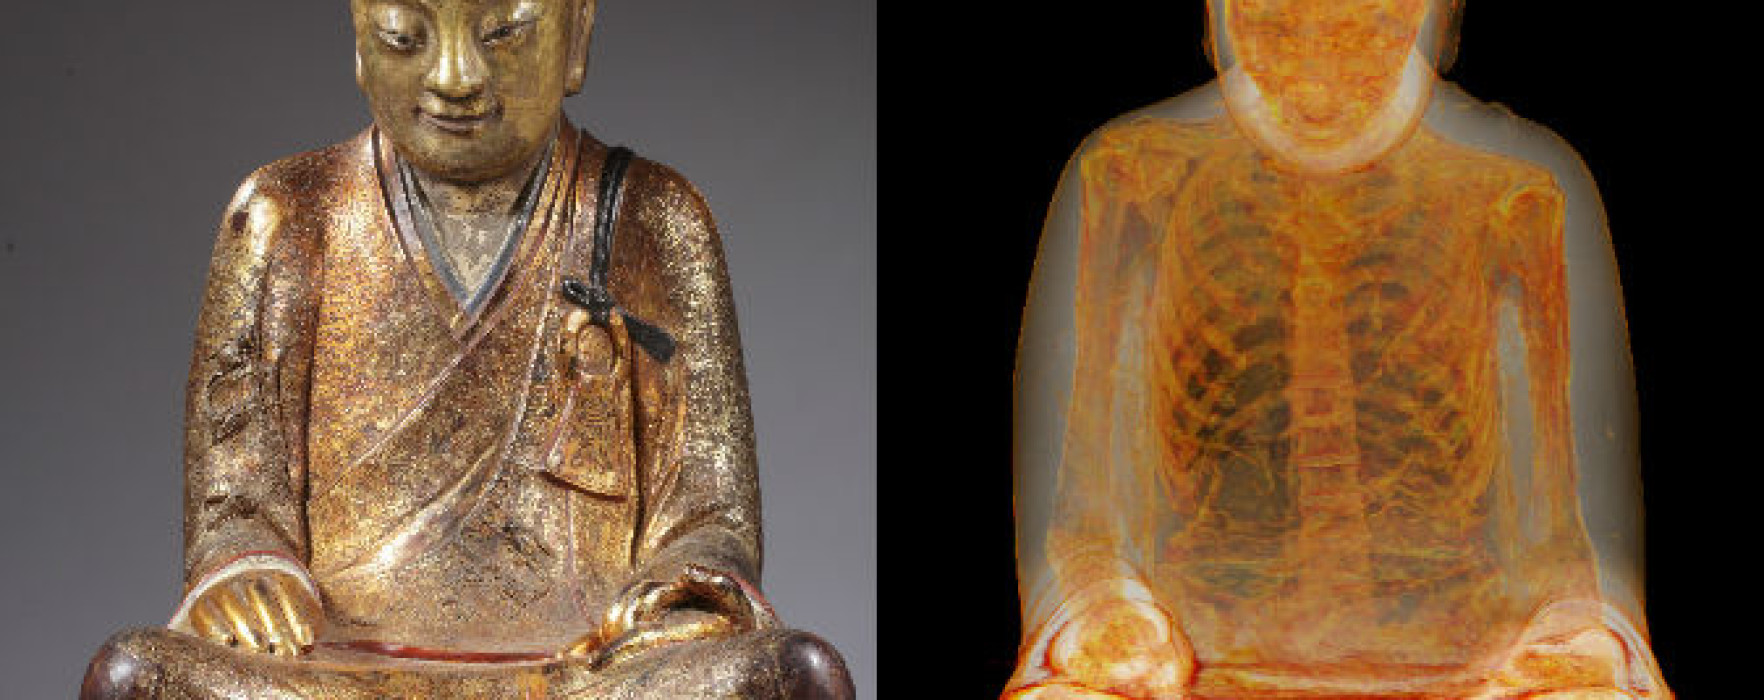 Buddhist zuk song ah minung ruang tawk